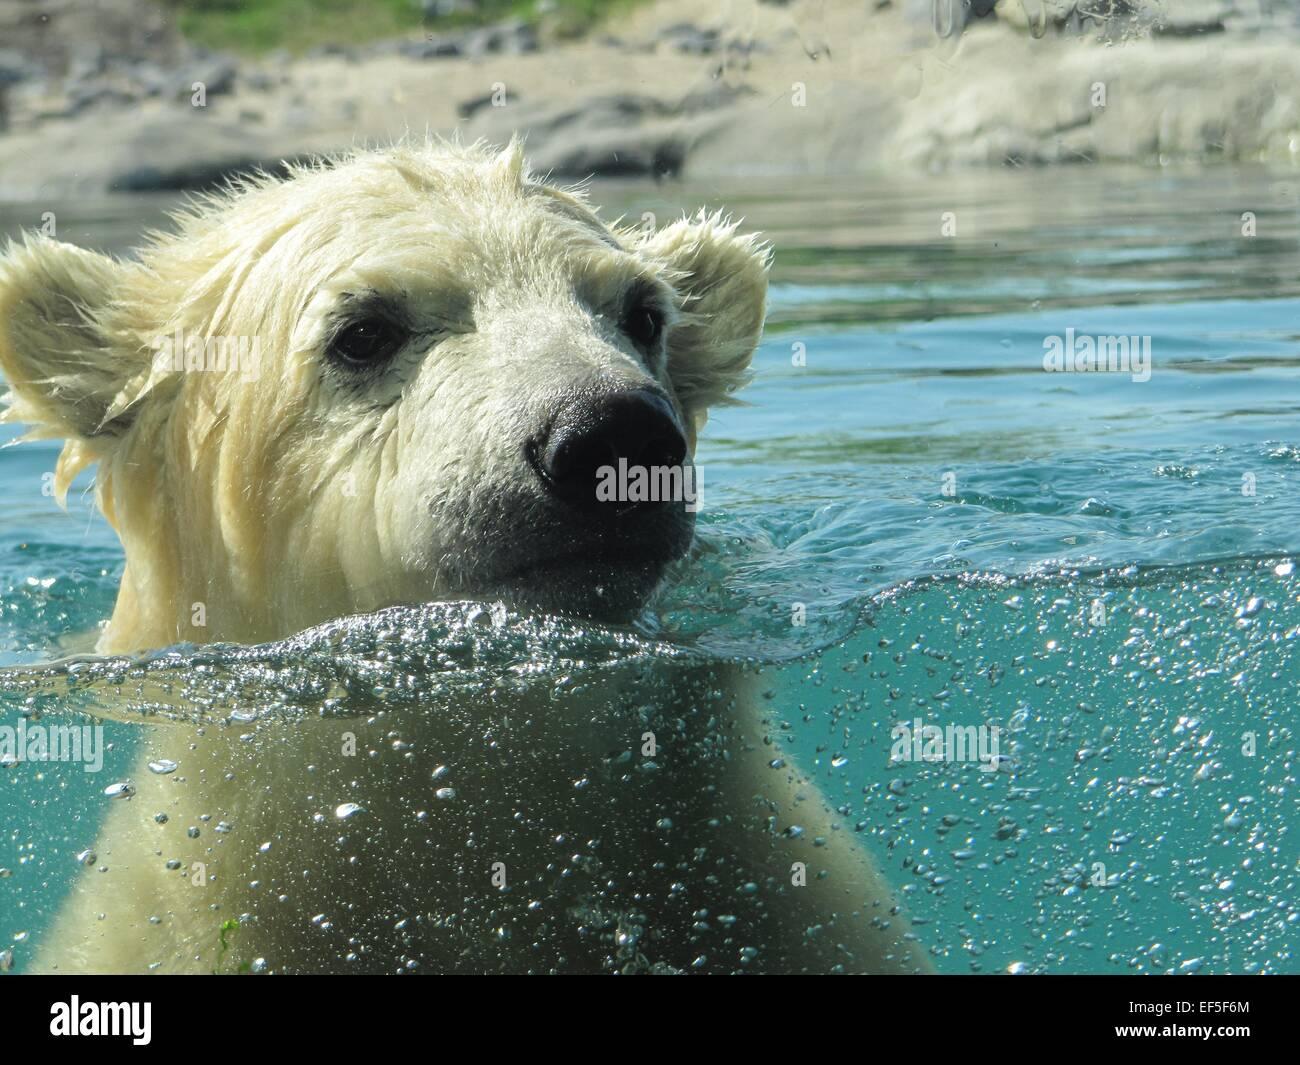 Polar Bear Swimming - Stock Image